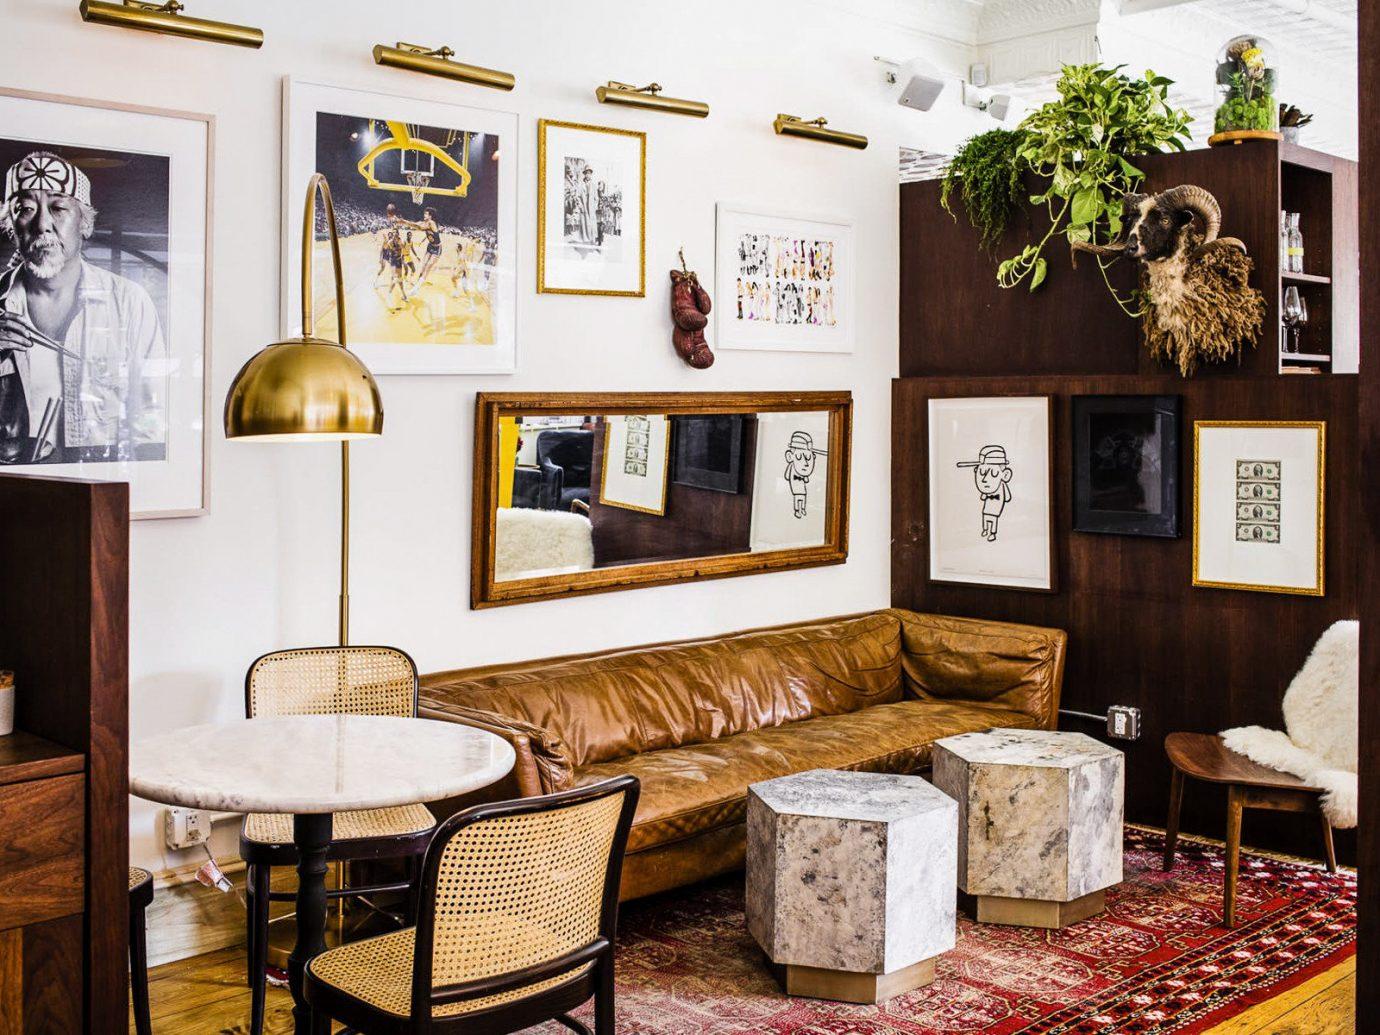 Food + Drink indoor floor Living room interior design furniture living room table area